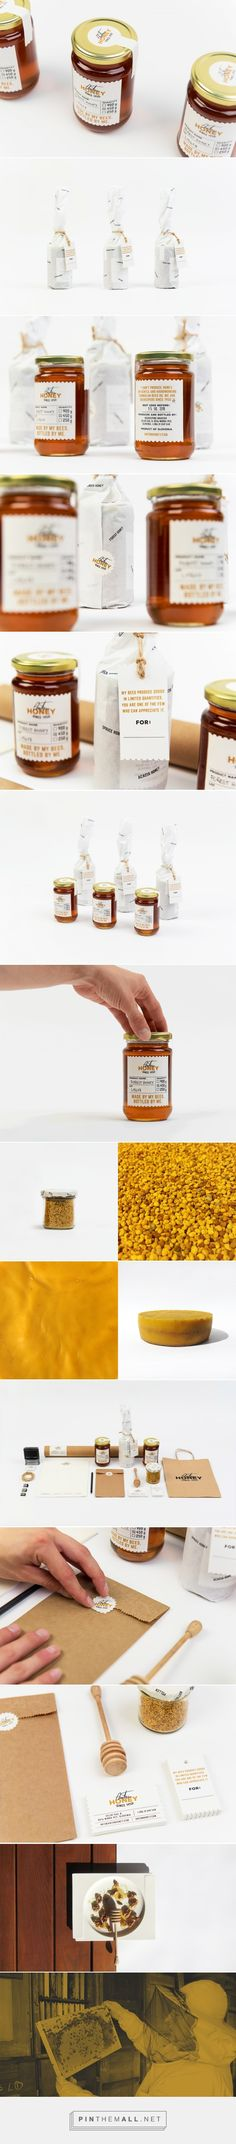 Anton Honey - Packaging of the World - Creative Package Design Gallery - http://www.packagingoftheworld.com/2016/09/anton-honey.html